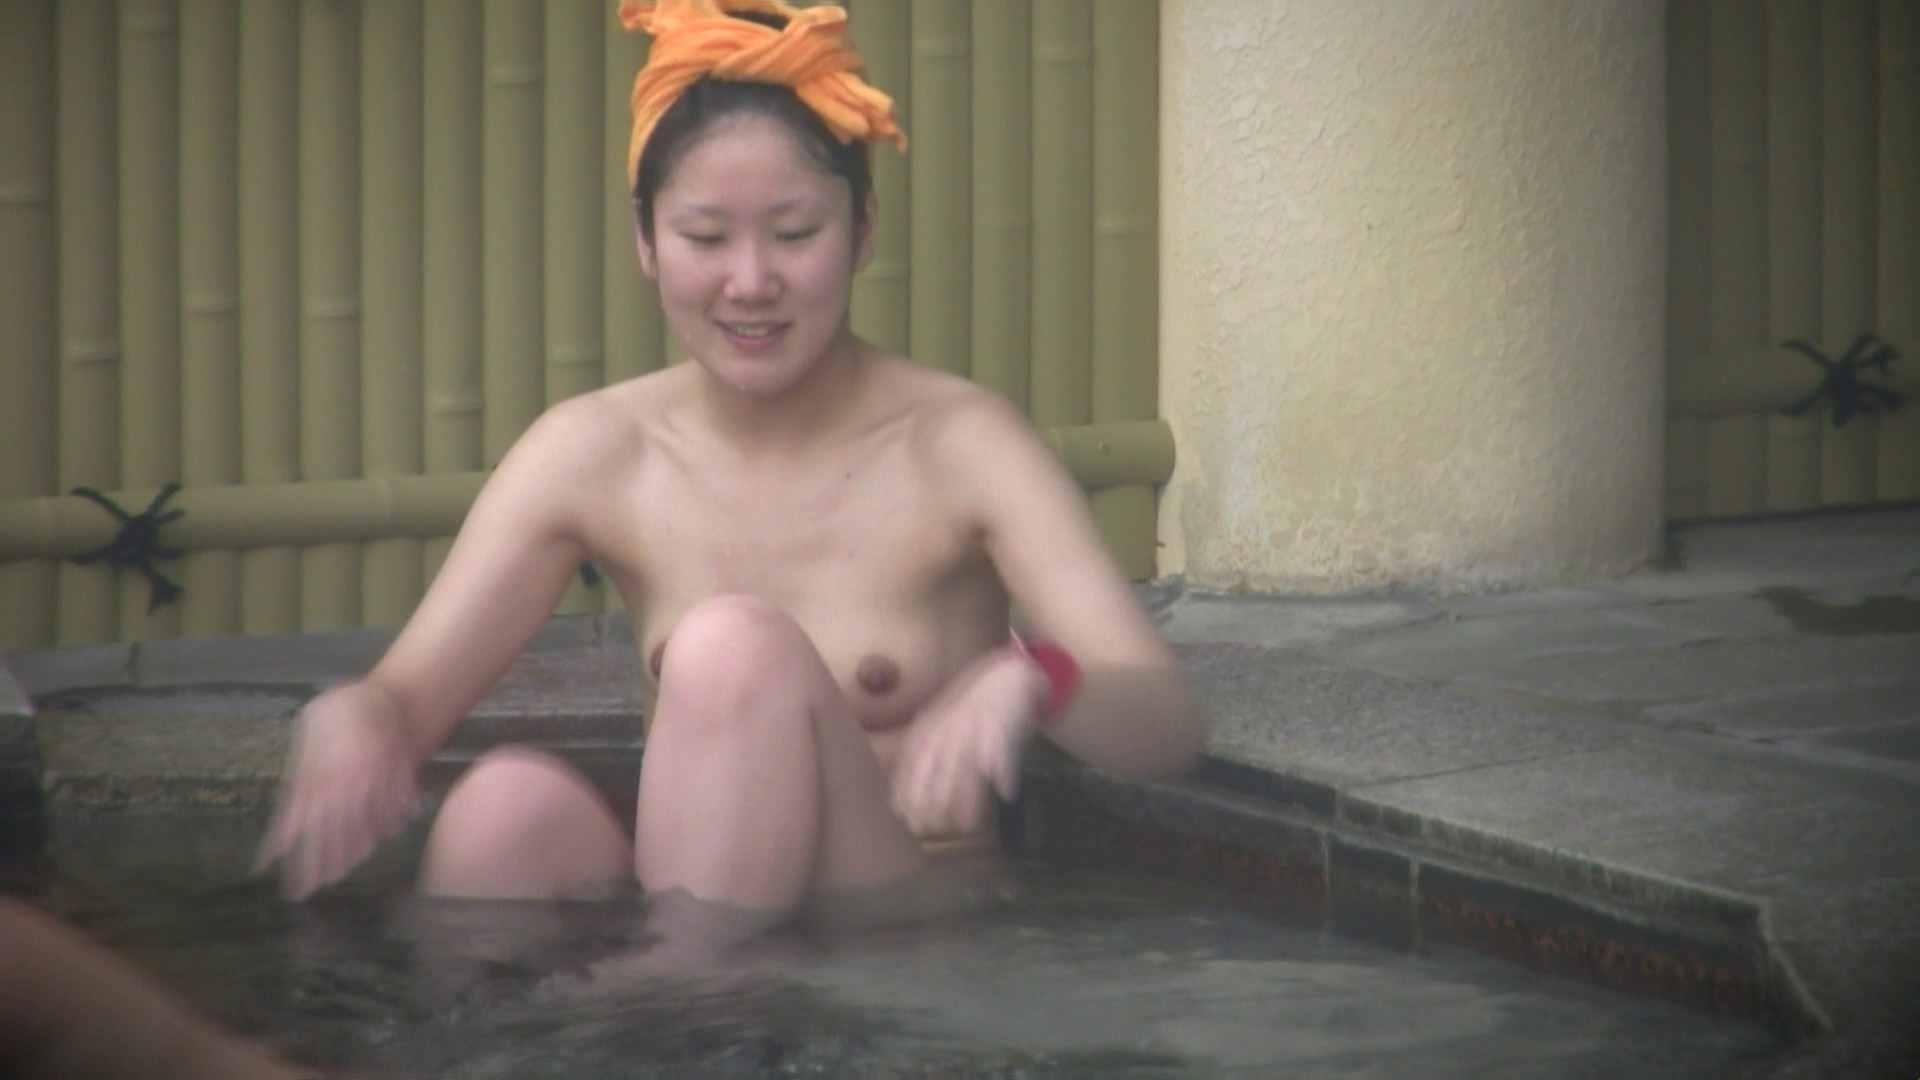 Aquaな露天風呂Vol.51【VIP限定】 露天風呂編 | 盗撮シリーズ  79PIX 75